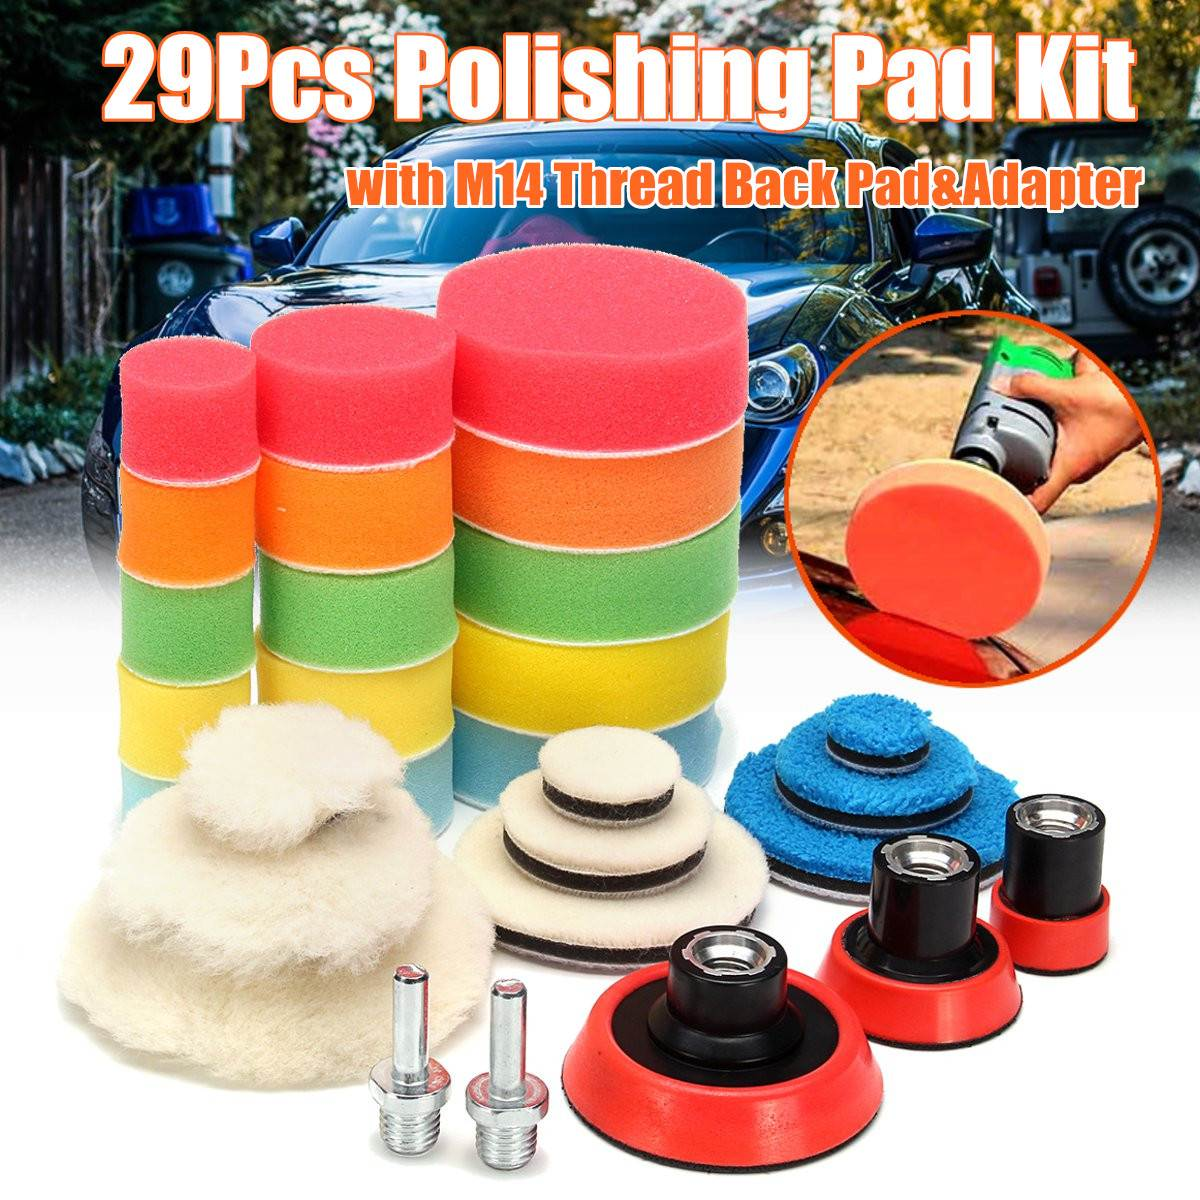 29Pcs Polishing Pad In Polishing Disc Buffing Pad 1-3 Inch Auto Car Polishing Pad For Car Polisher +Drill Adaptor M14 Power Tool